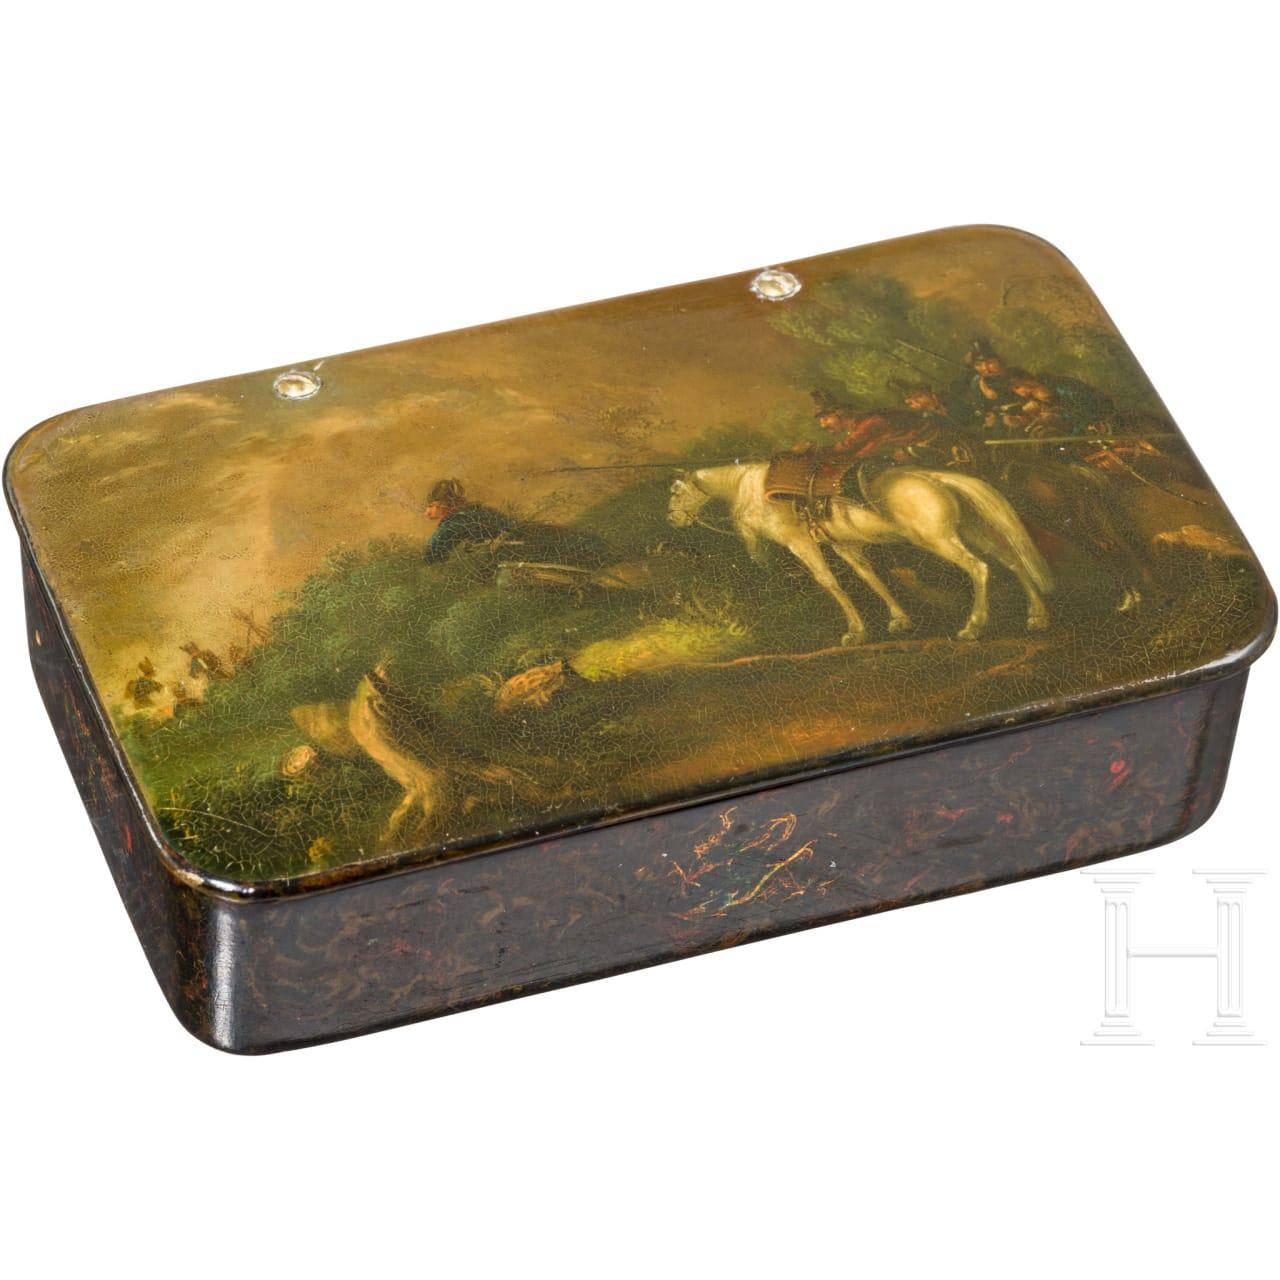 Stobwasser box with depiction of the battle at Ölper, Brunswick, c. 1820